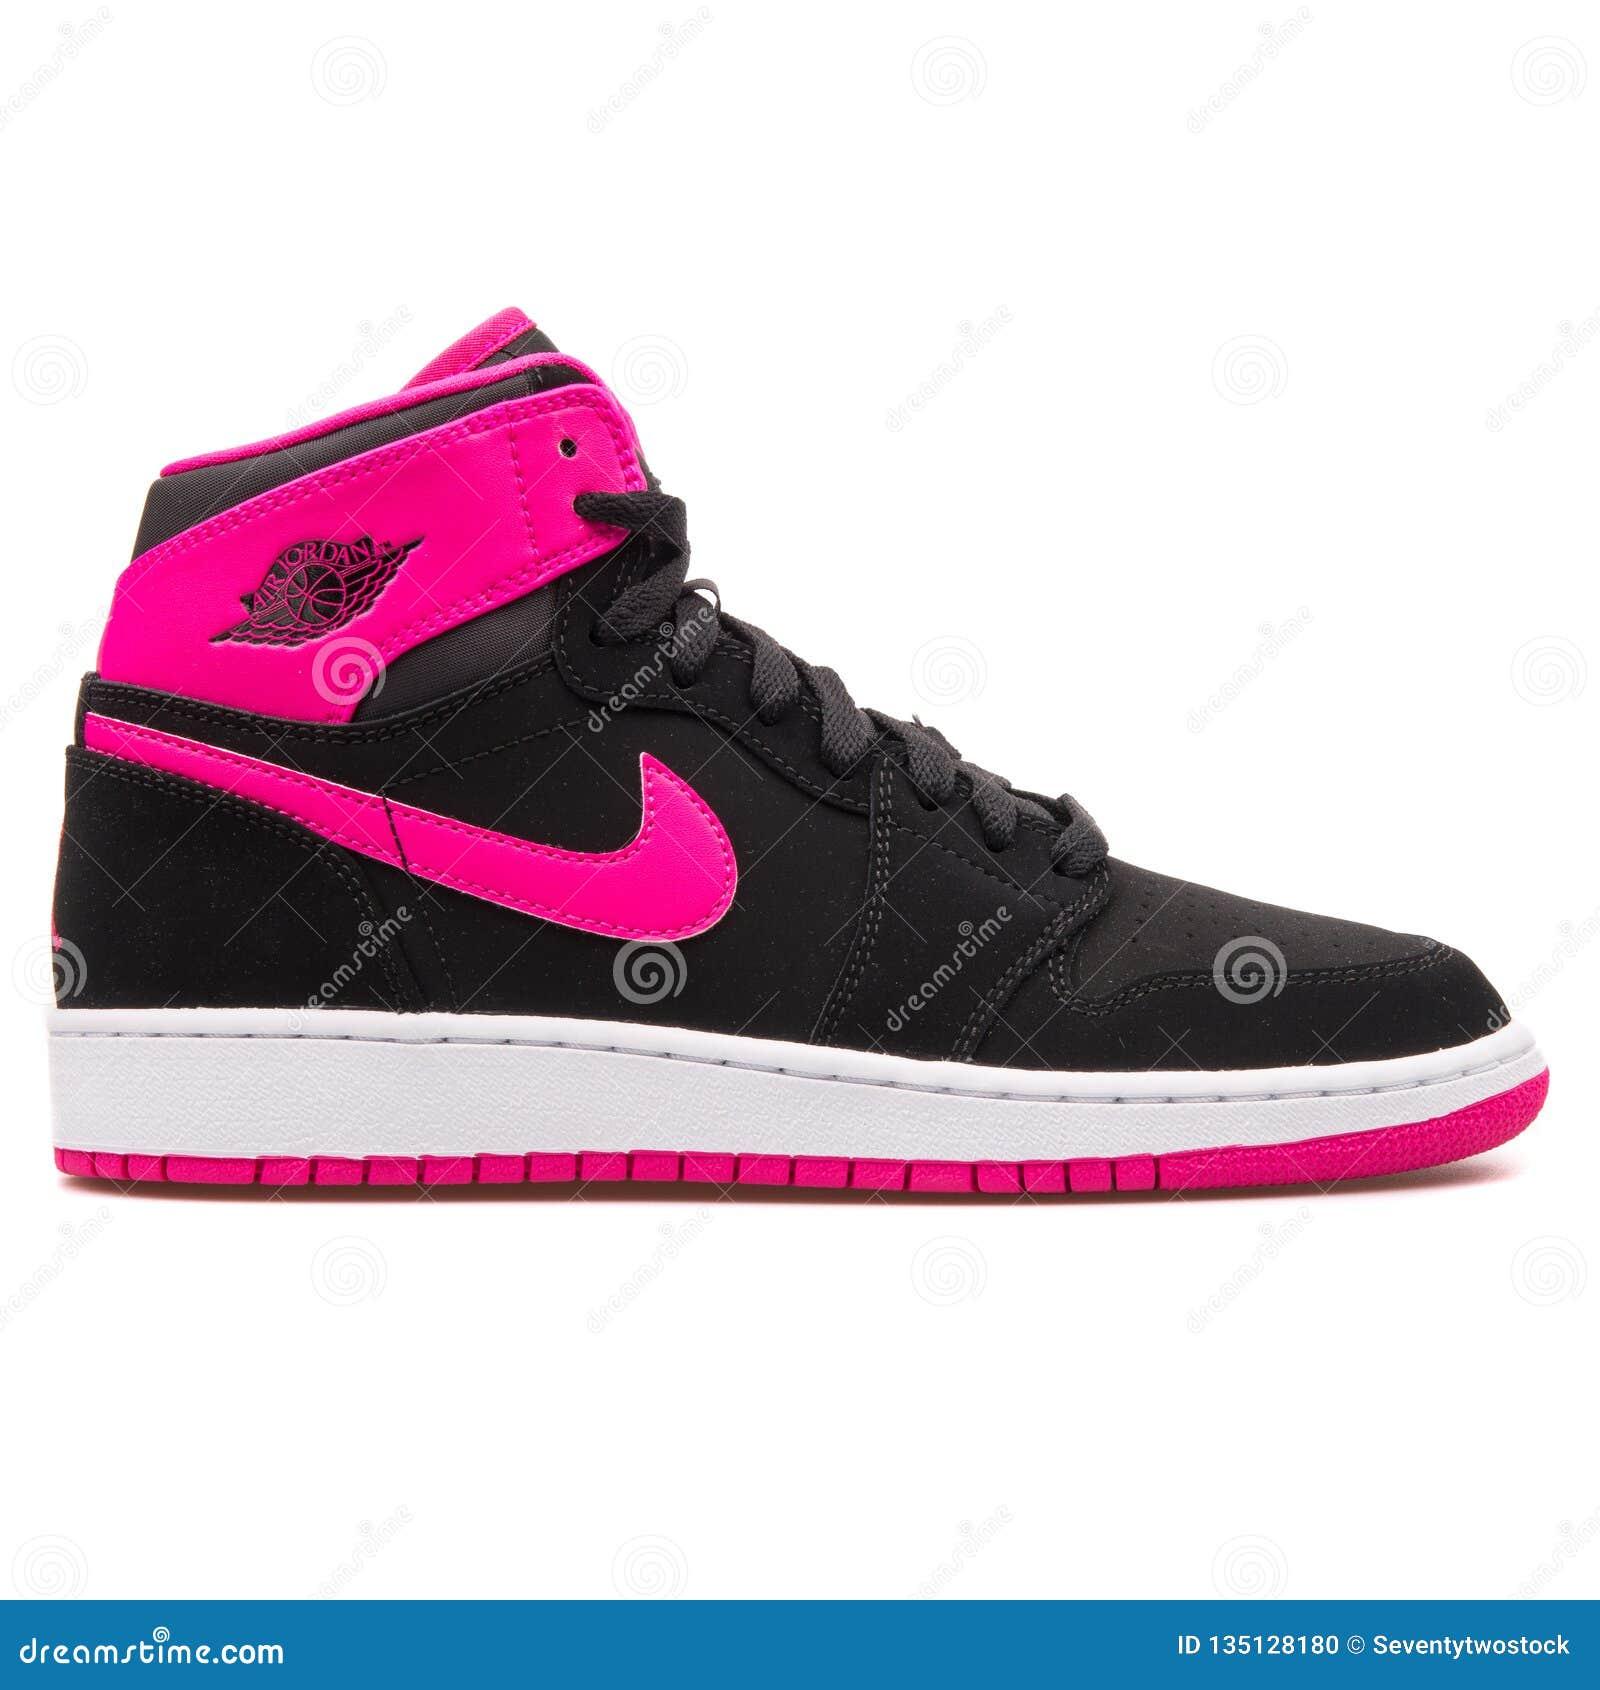 Nike Jordan 1 Retro High GG Black